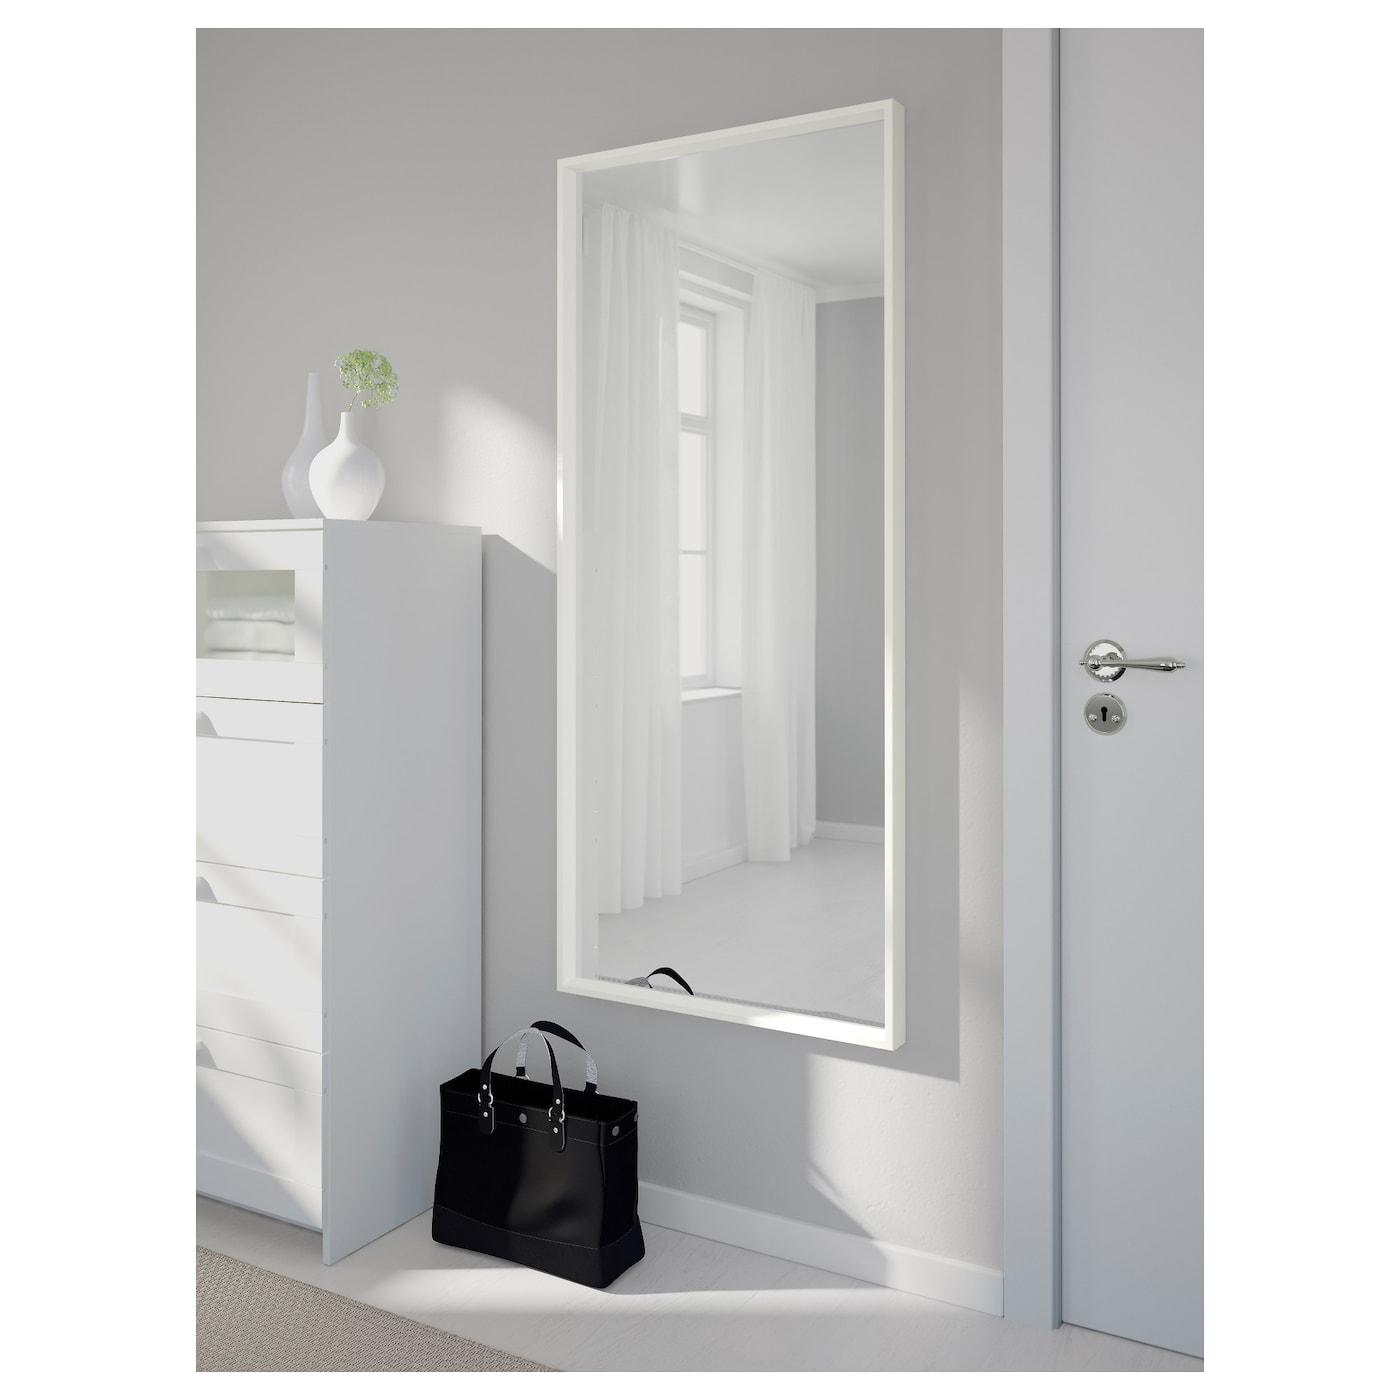 Nissedal mirror white 65x150 cm ikea for Miroir nissedal